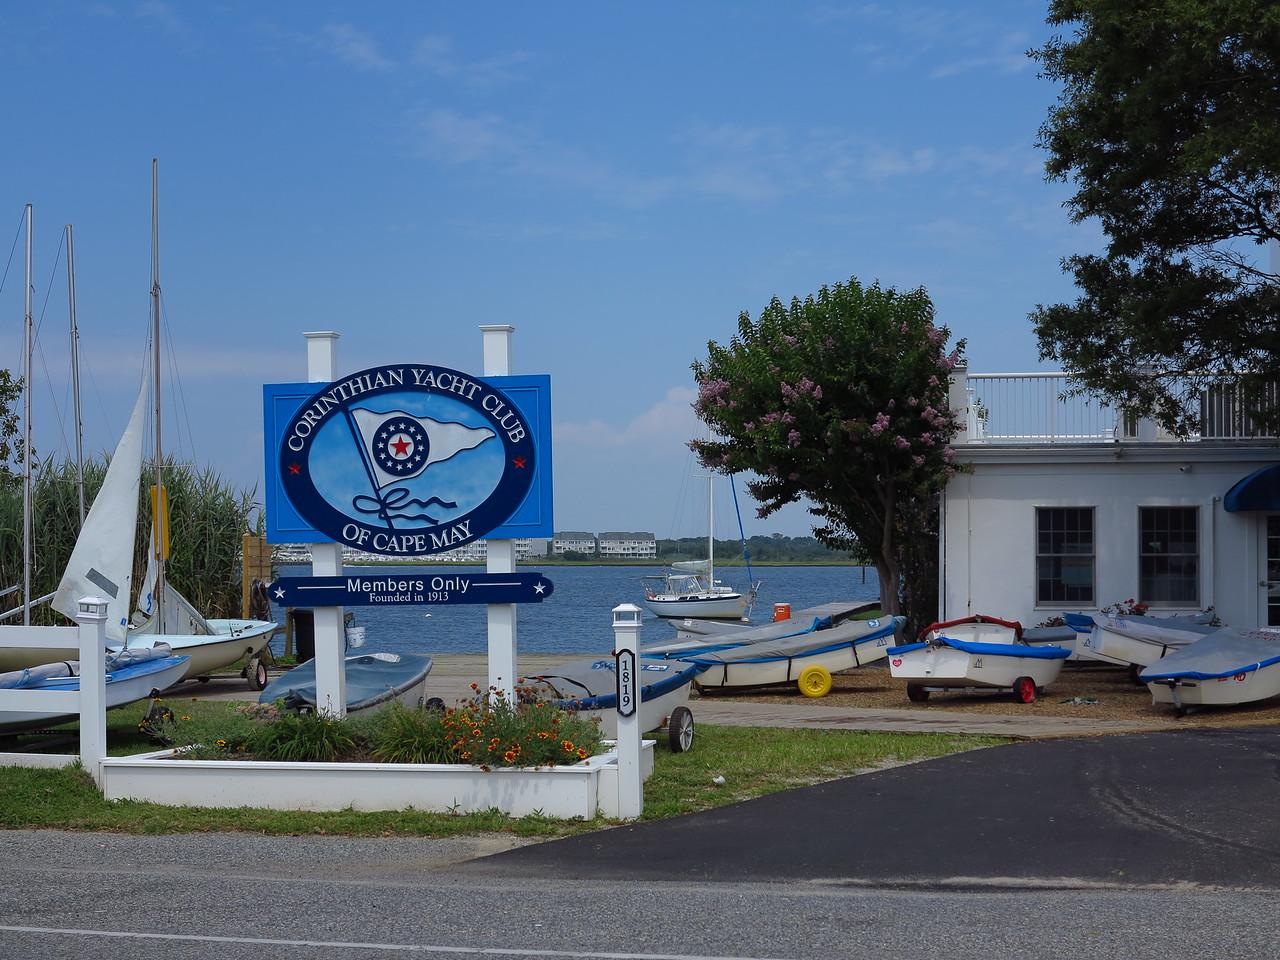 Corinthian Yacht Club of Cape May